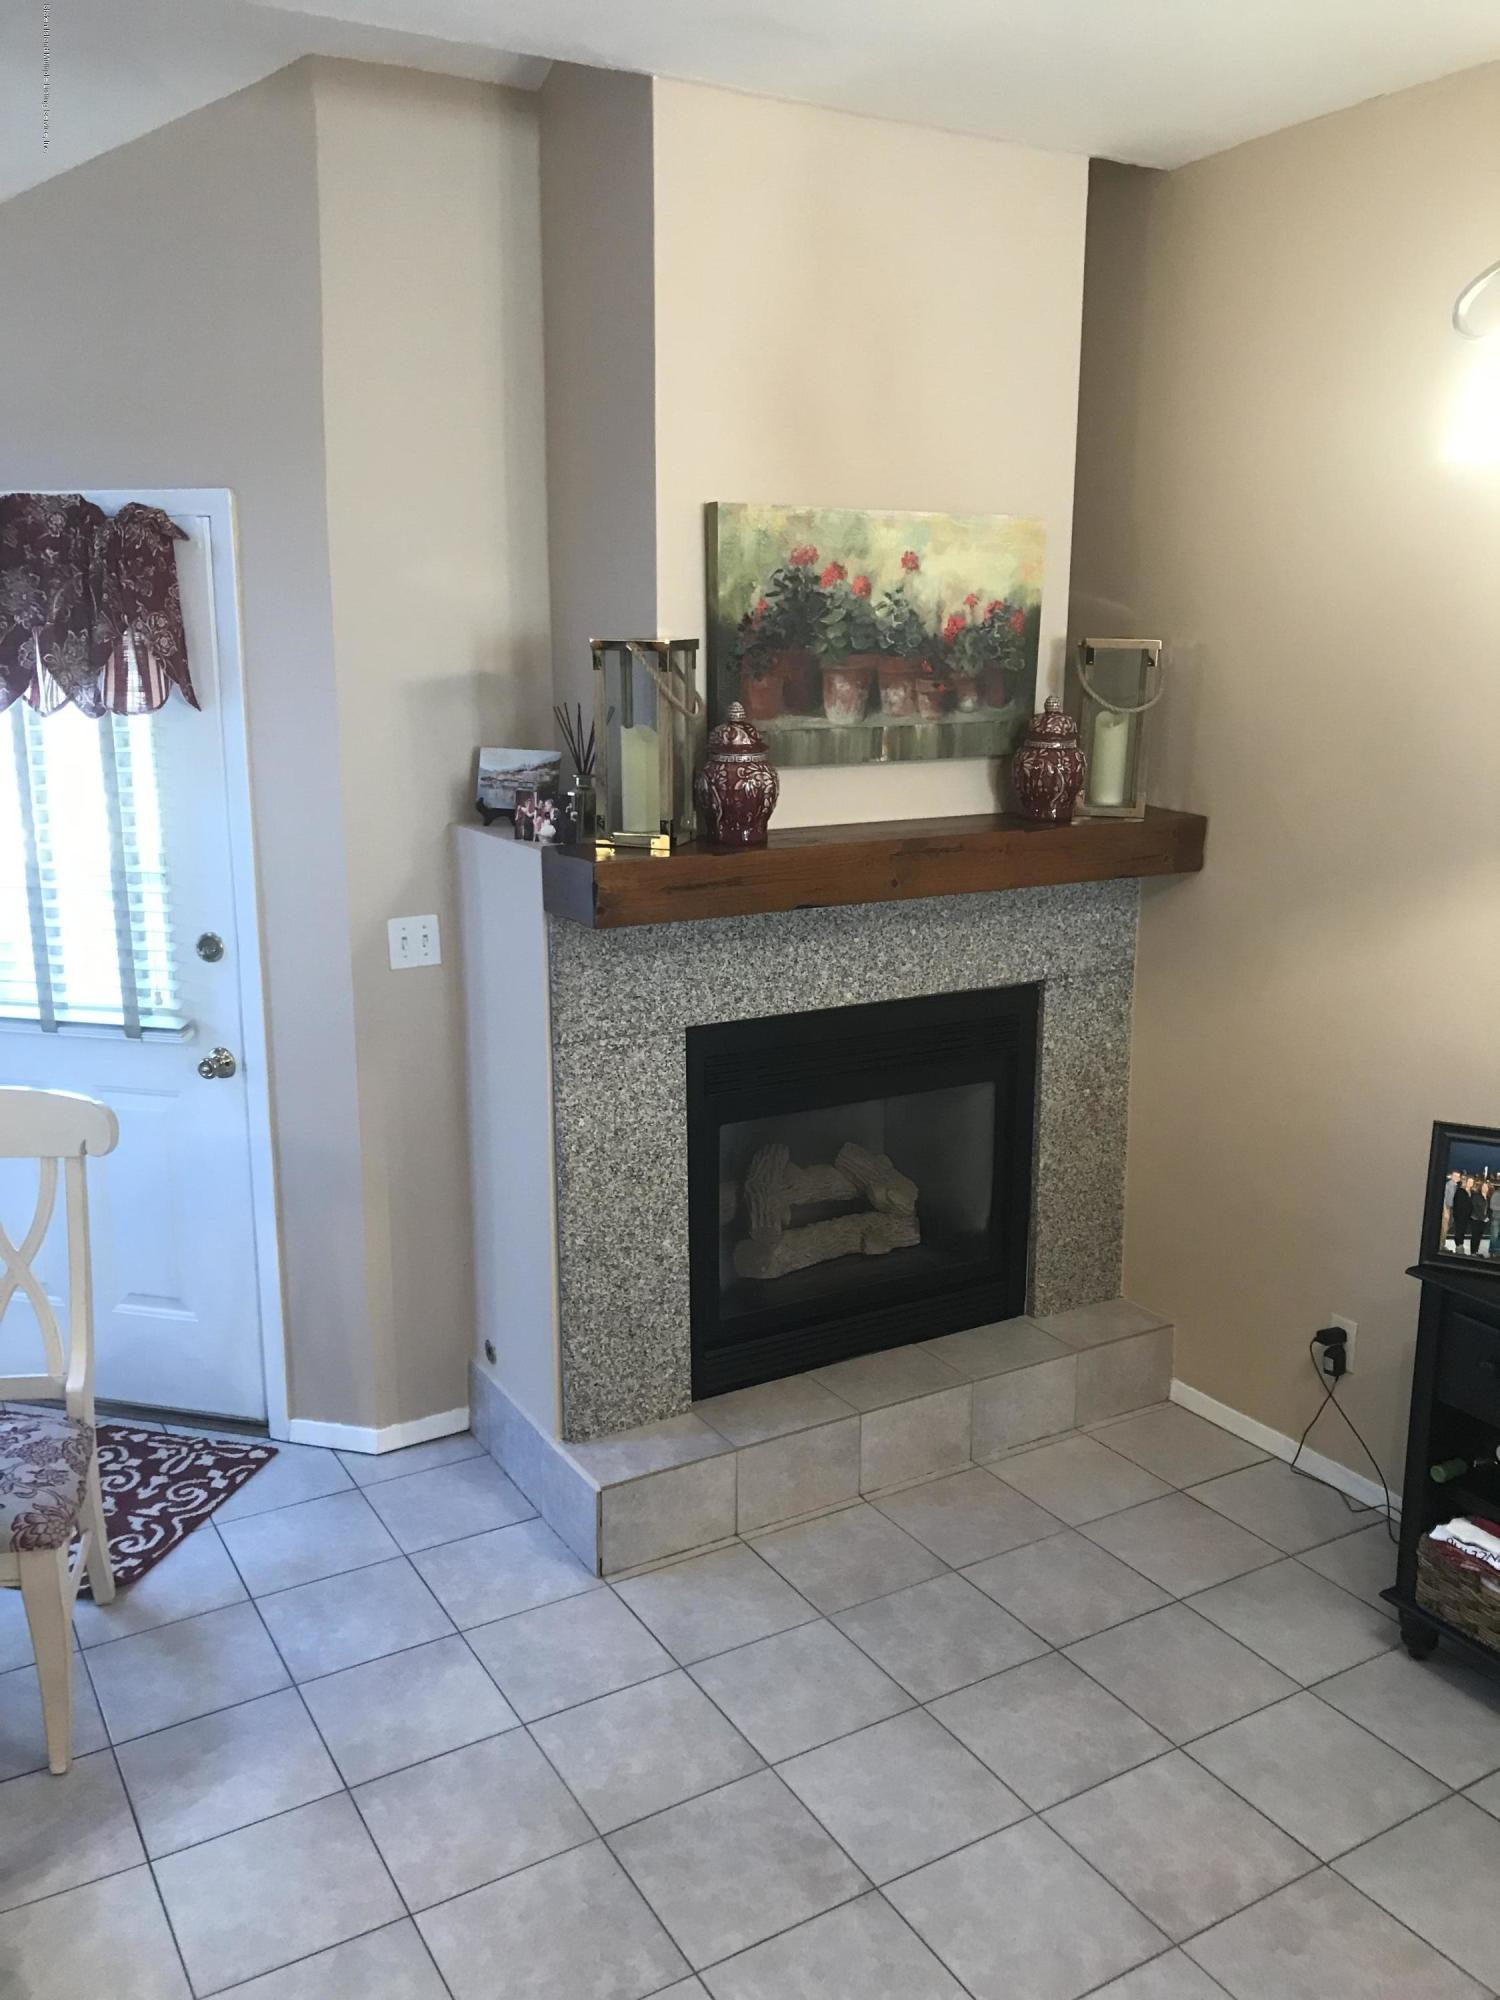 Single Family - Attached 17 Wolcott Avenue  Staten Island, NY 10312, MLS-1126556-22